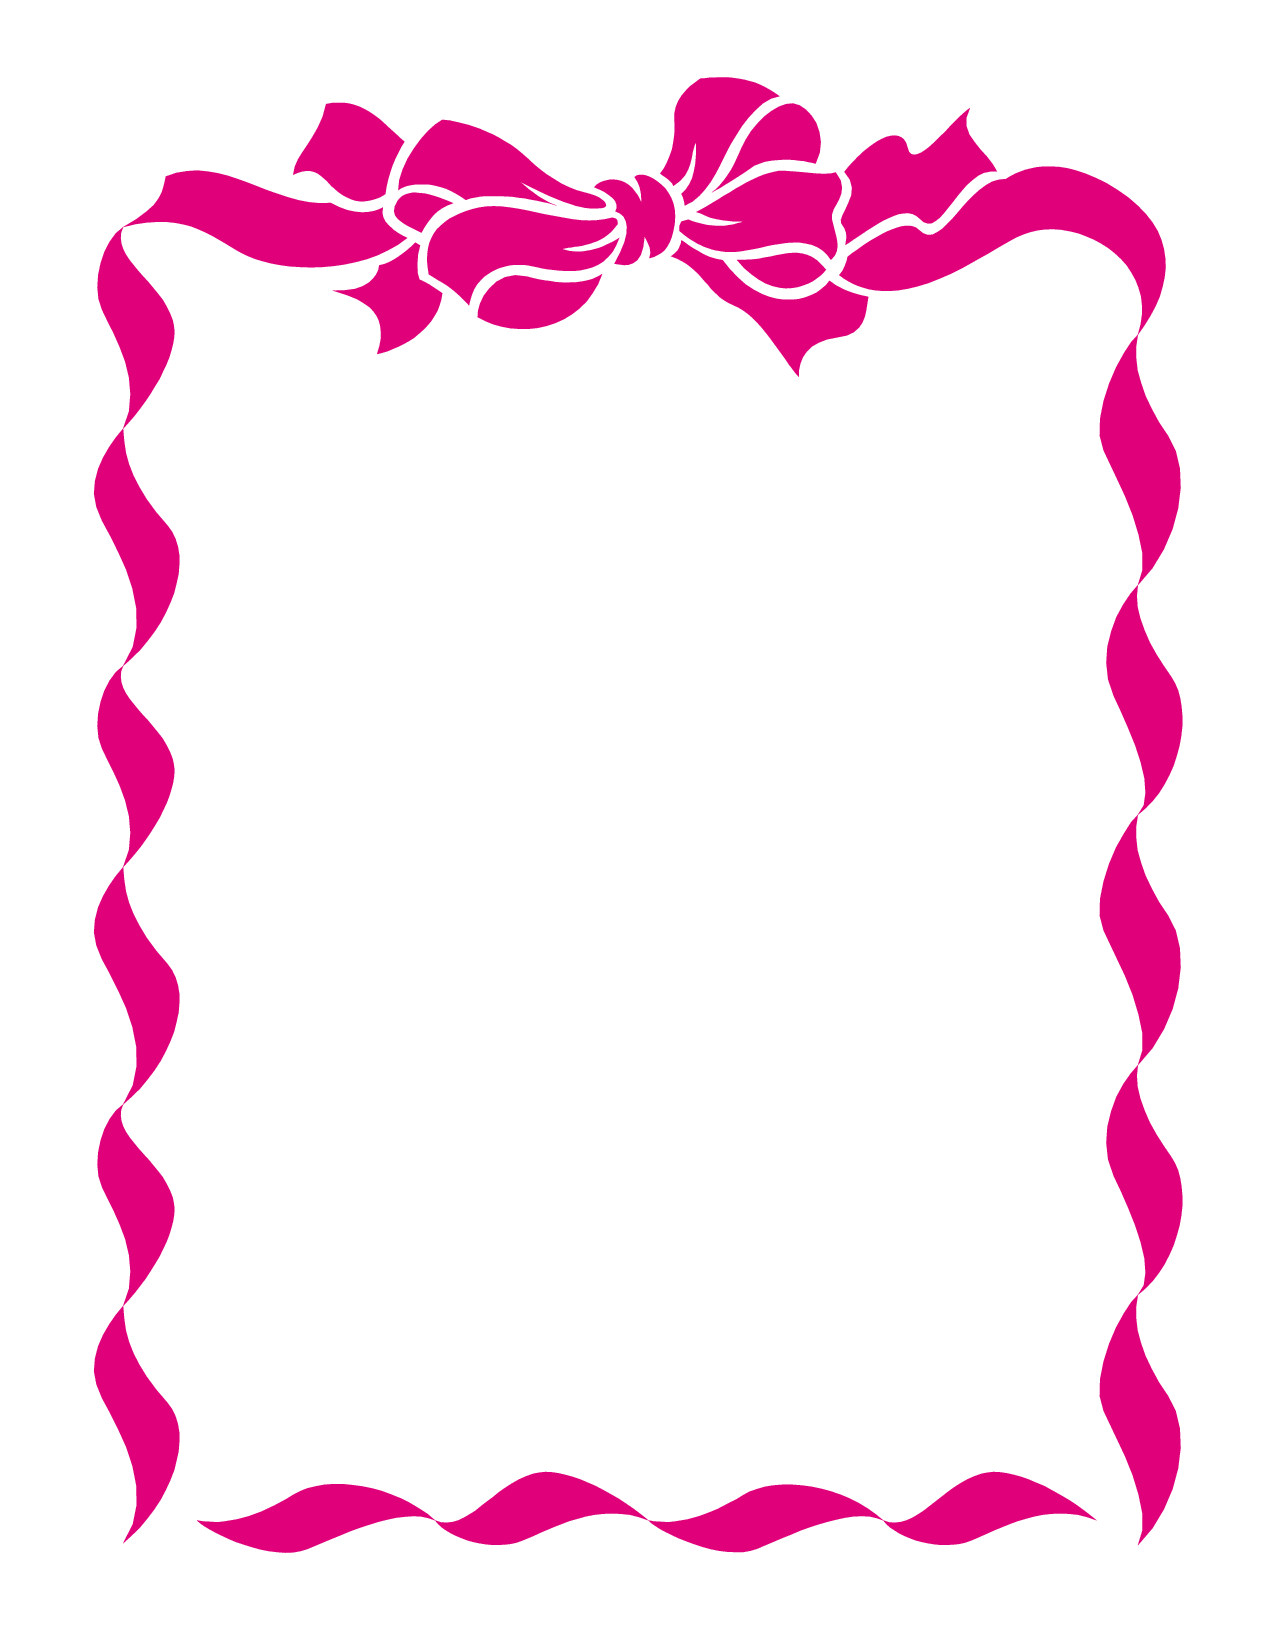 Free Border Ribbon Cliparts, Download Free Clip Art, Free Clip Art.